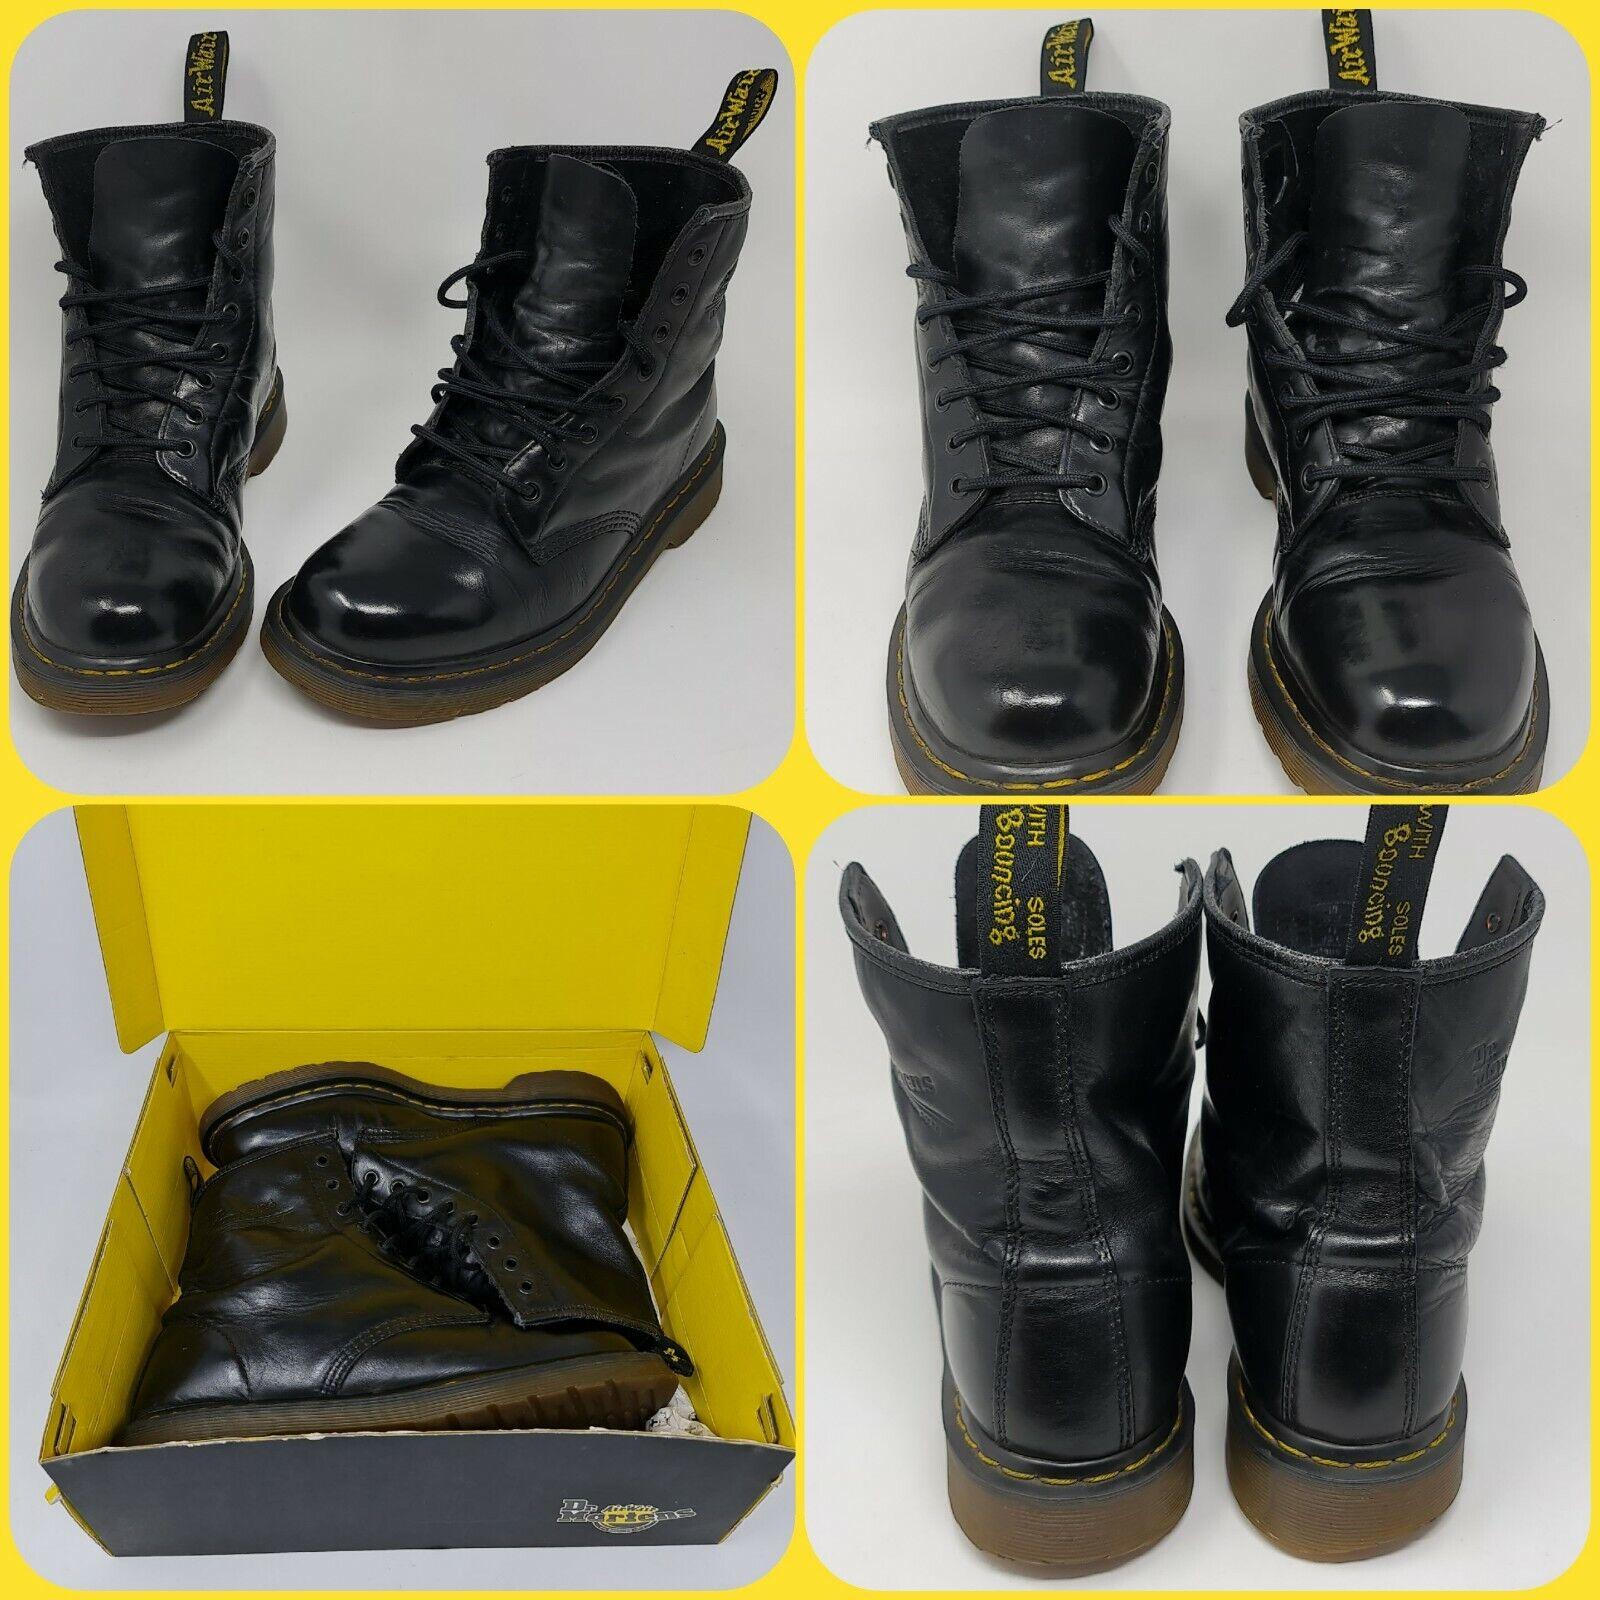 Dr Martens The Original AW501 Boots In Black UK Size 9 - US Size men 10 - Eur 43